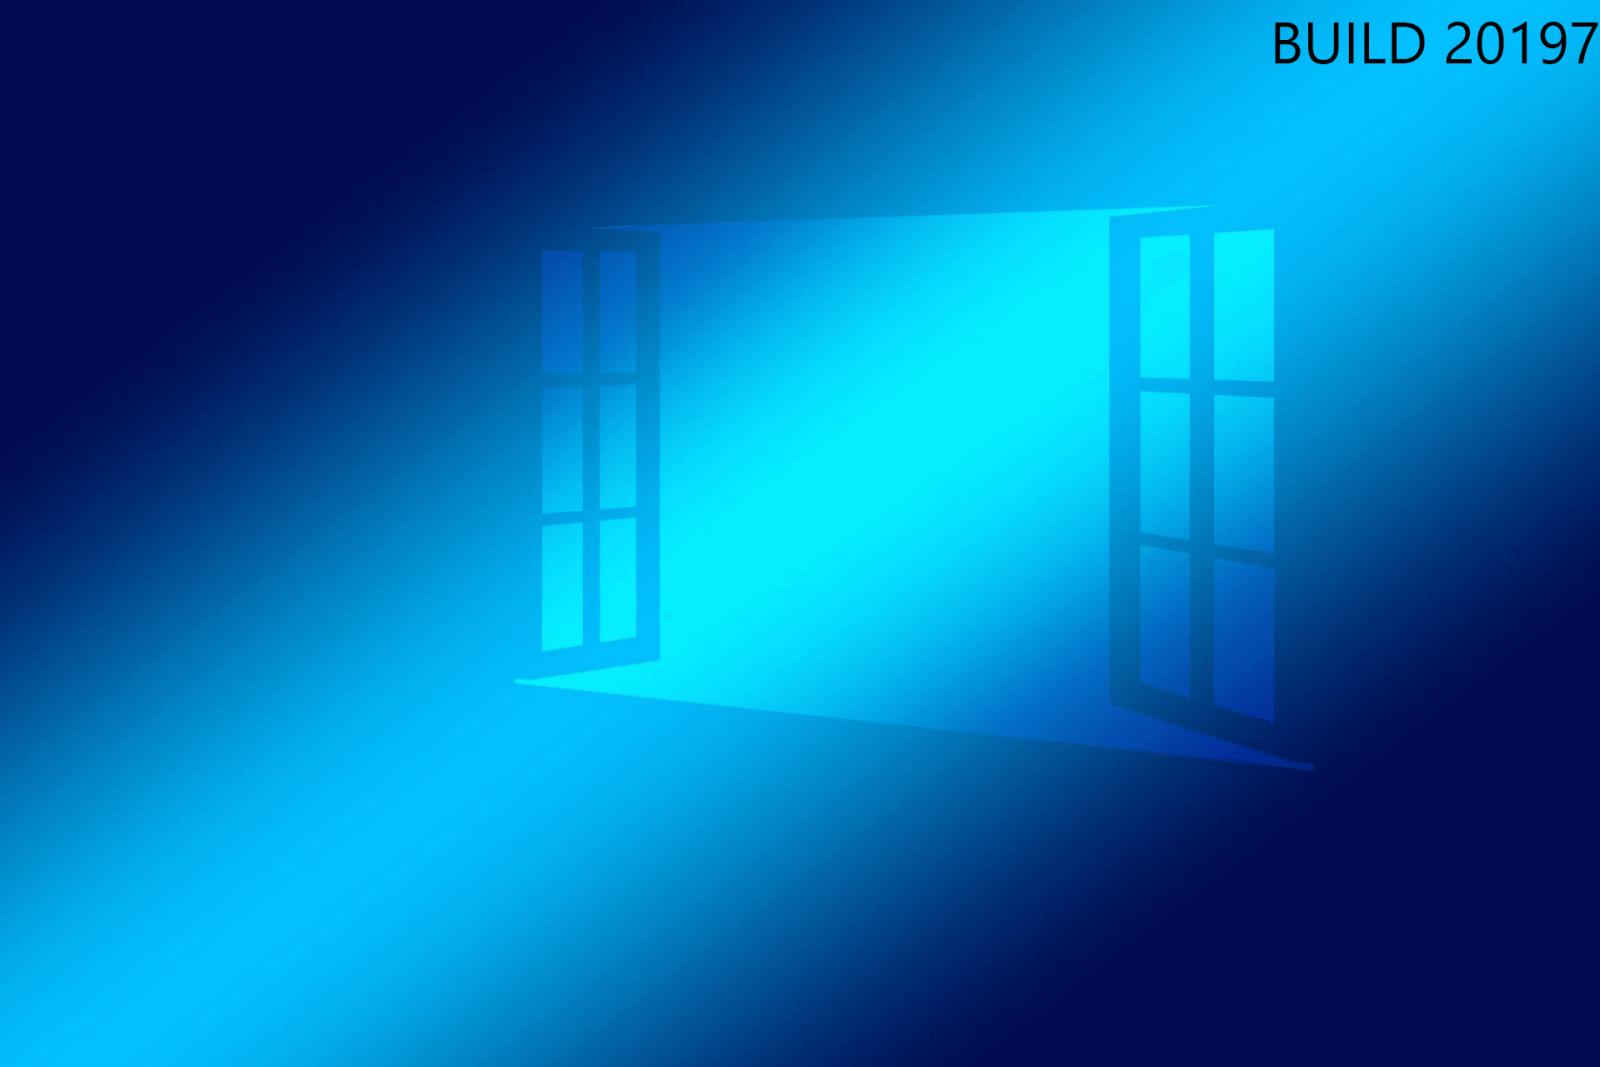 Windows 10 Insider Preview Build 20197 Changelog